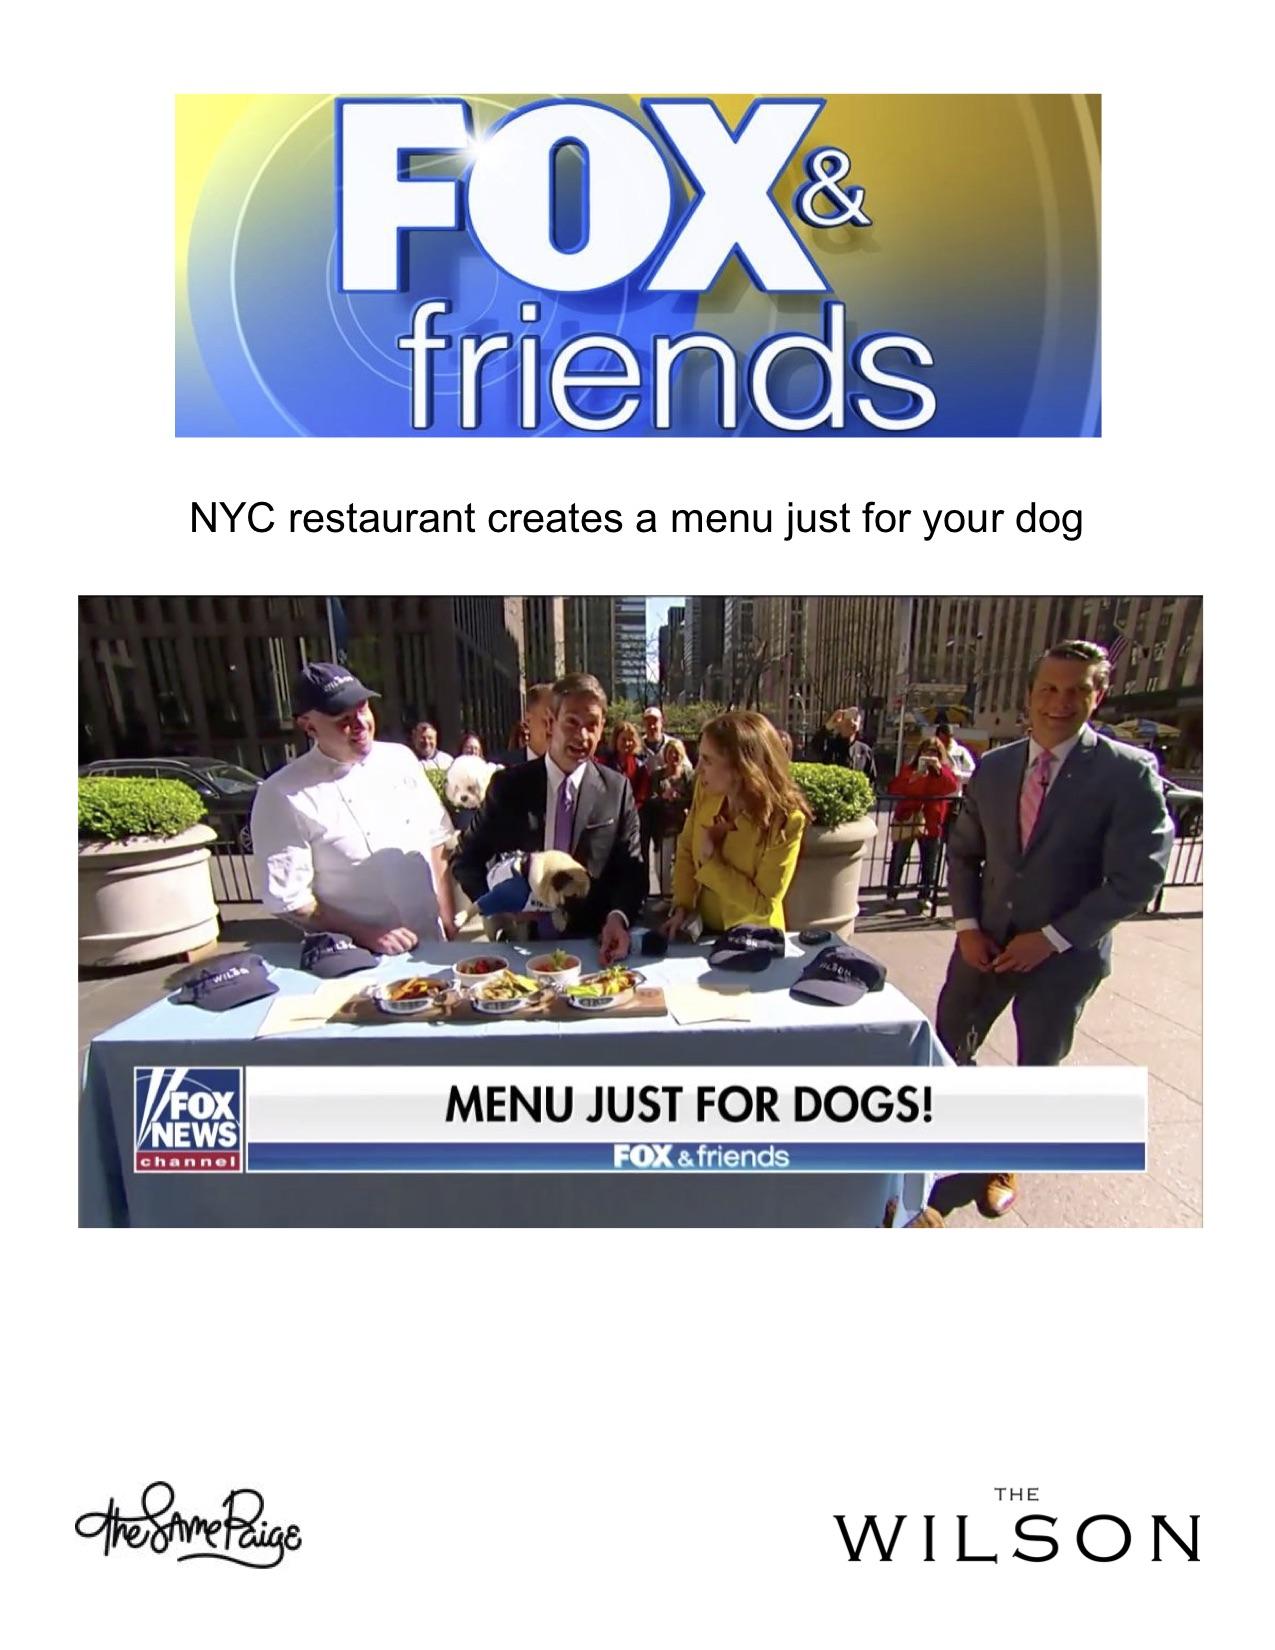 Fox&Friends_TheWilson_4_27_2019.jpg